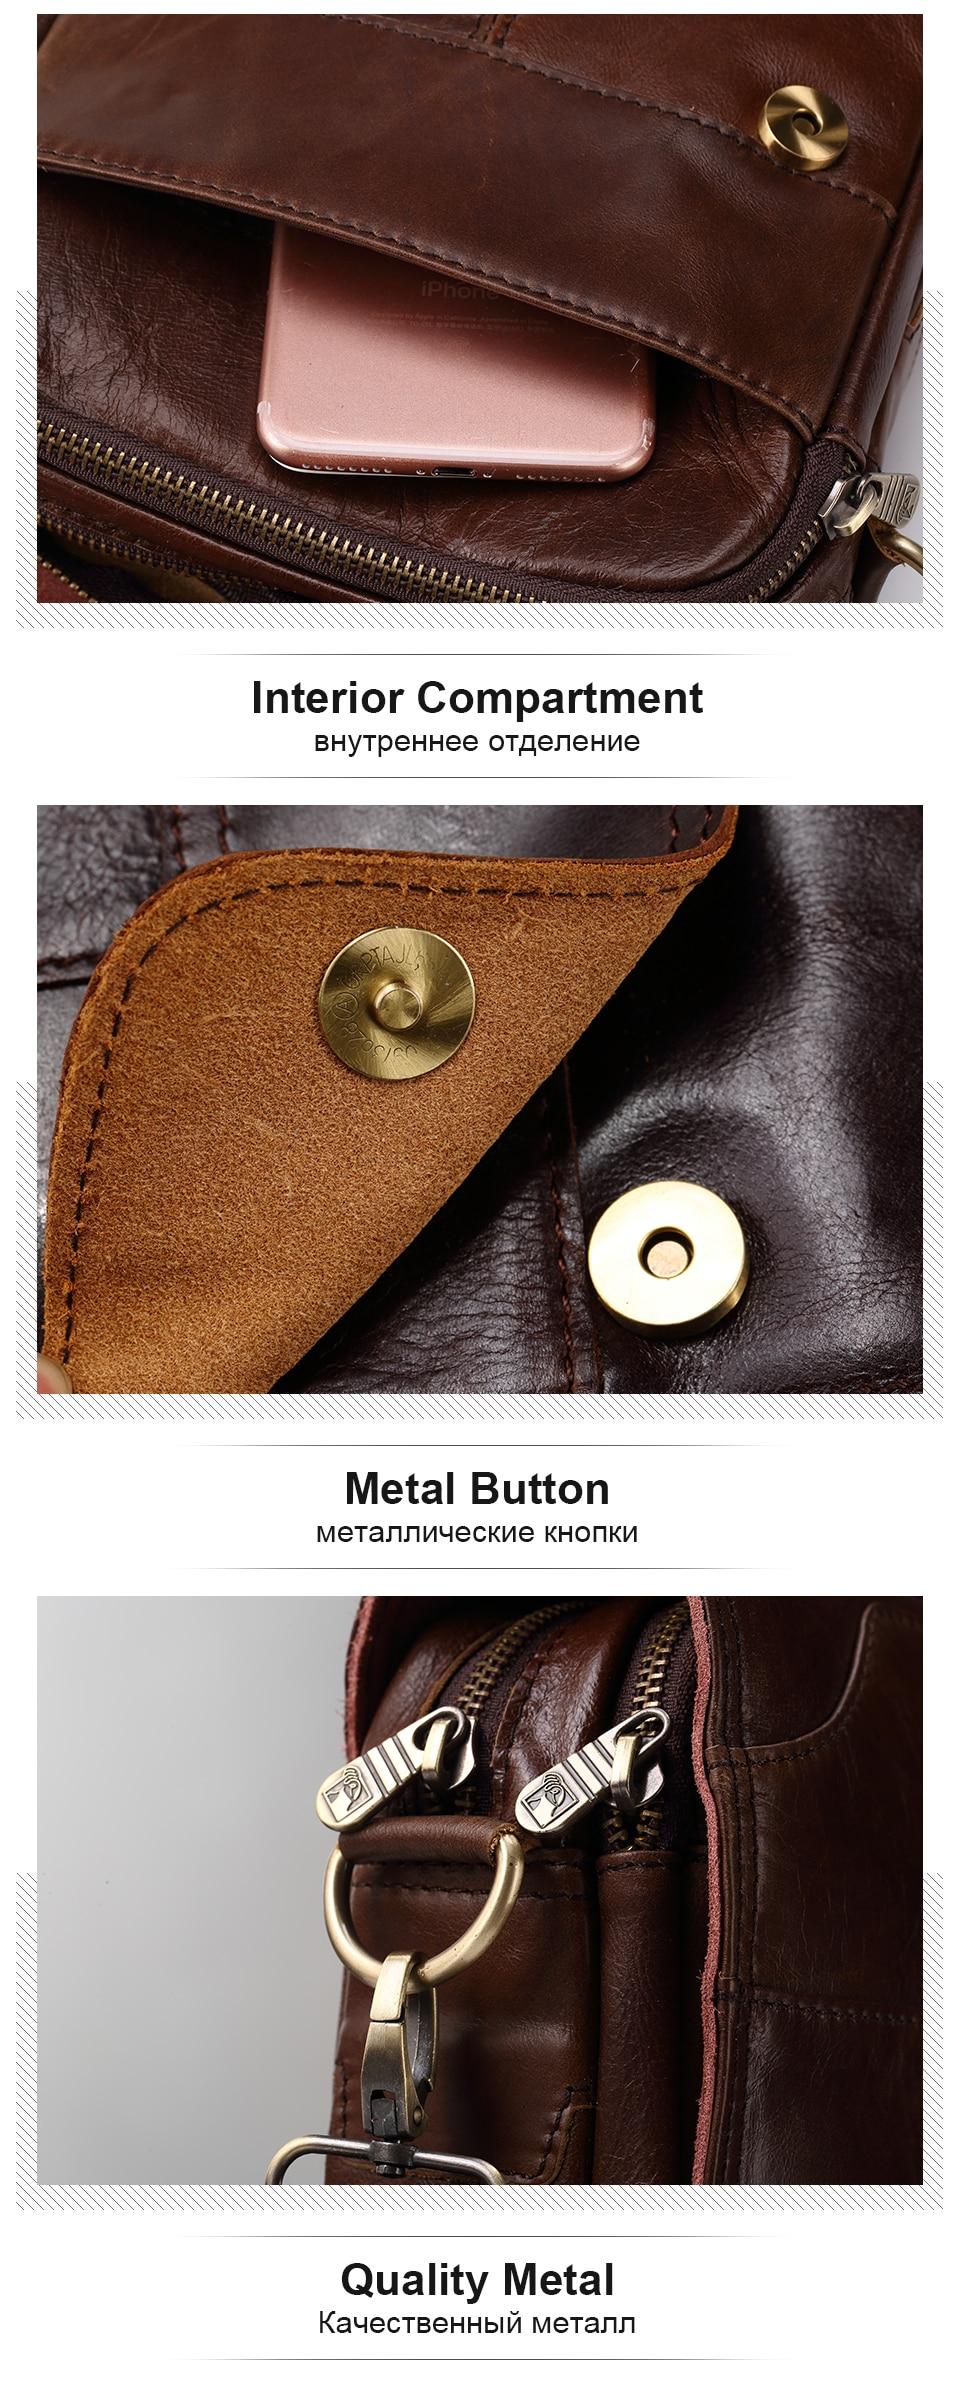 HTB1d ToawmTBuNjy1Xbq6yMrVXa1 - Fashion Genuine Leather Men's High Quality Small Messenger Bag-Fashion Genuine Leather Men's High Quality Small Messenger Bag